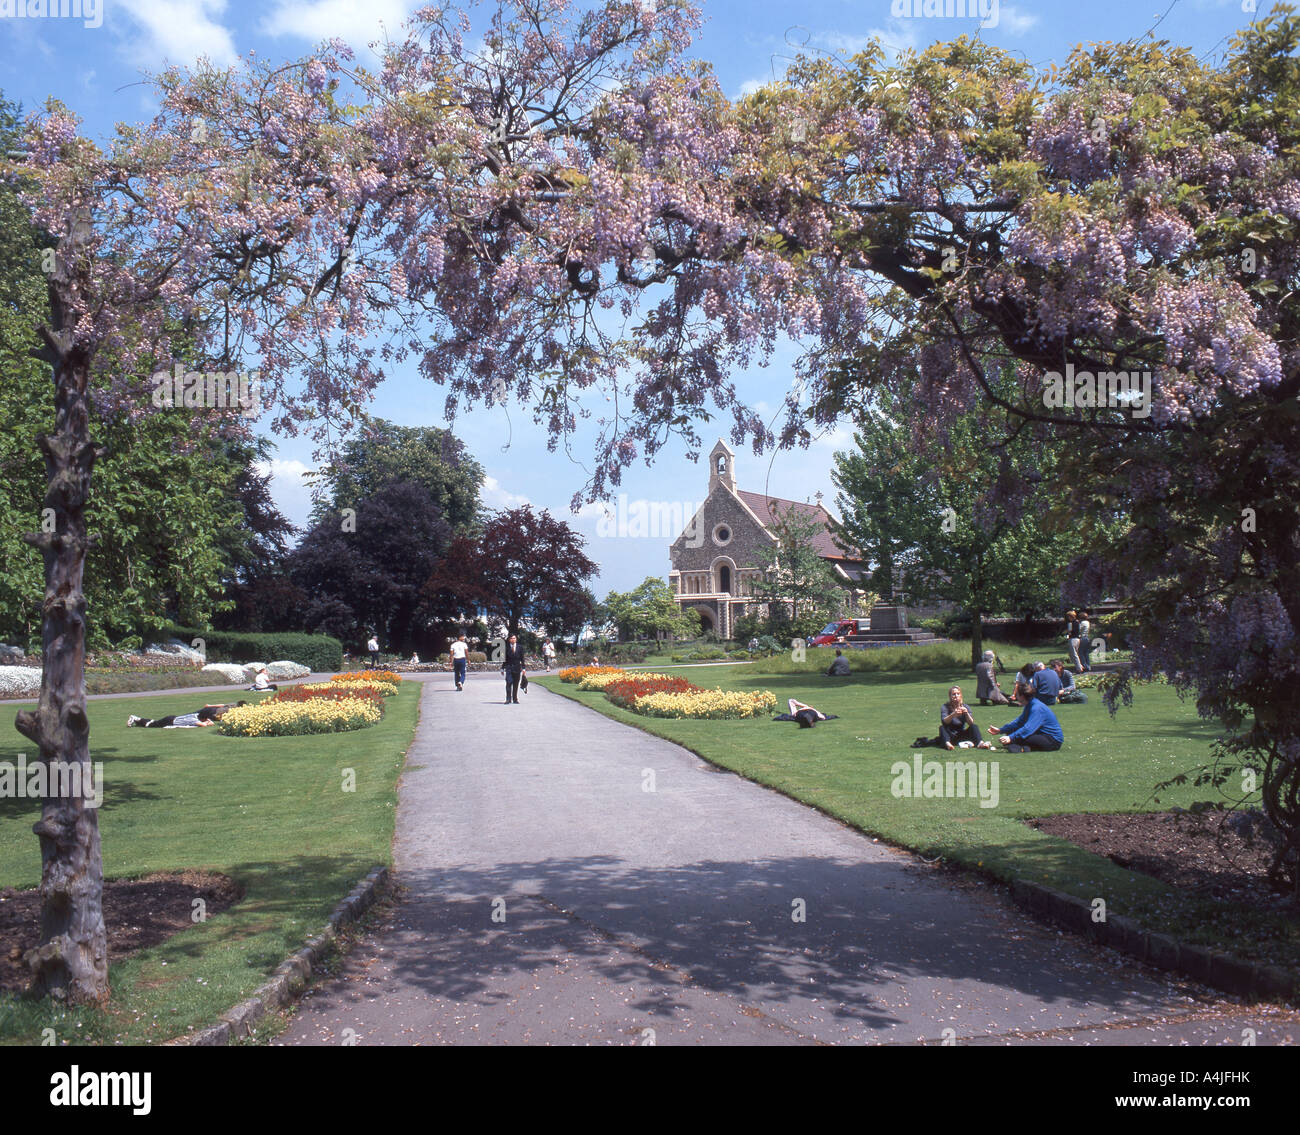 Forbury Gardens, Reading, Berkshire, England, United Kingdom Stock Photo